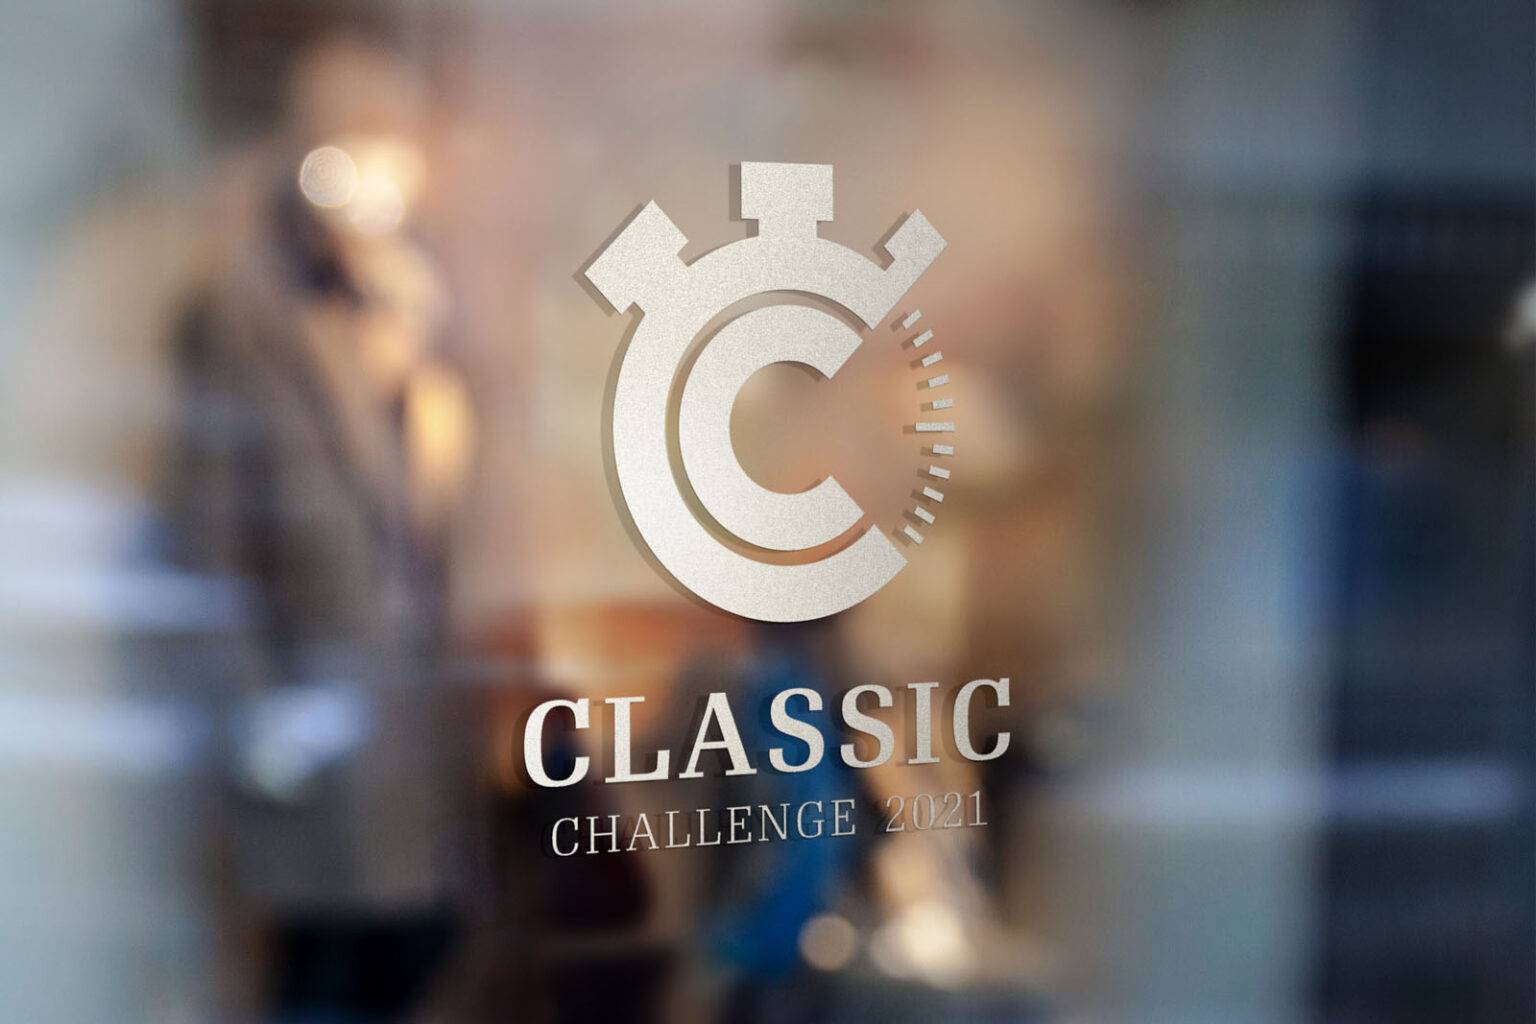 CLASSIC CHALLENGE logo